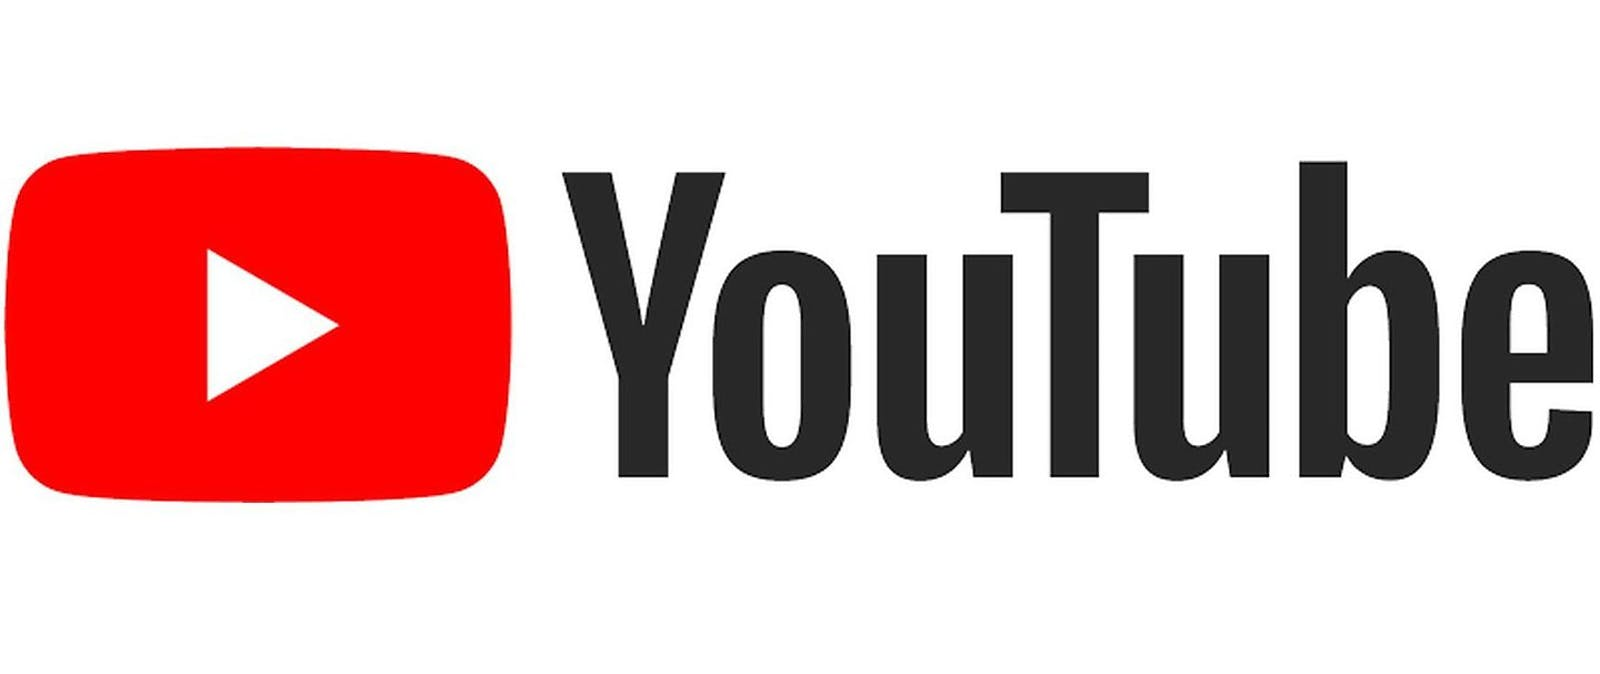 Youtube håller i kostnadsfri filmfestival